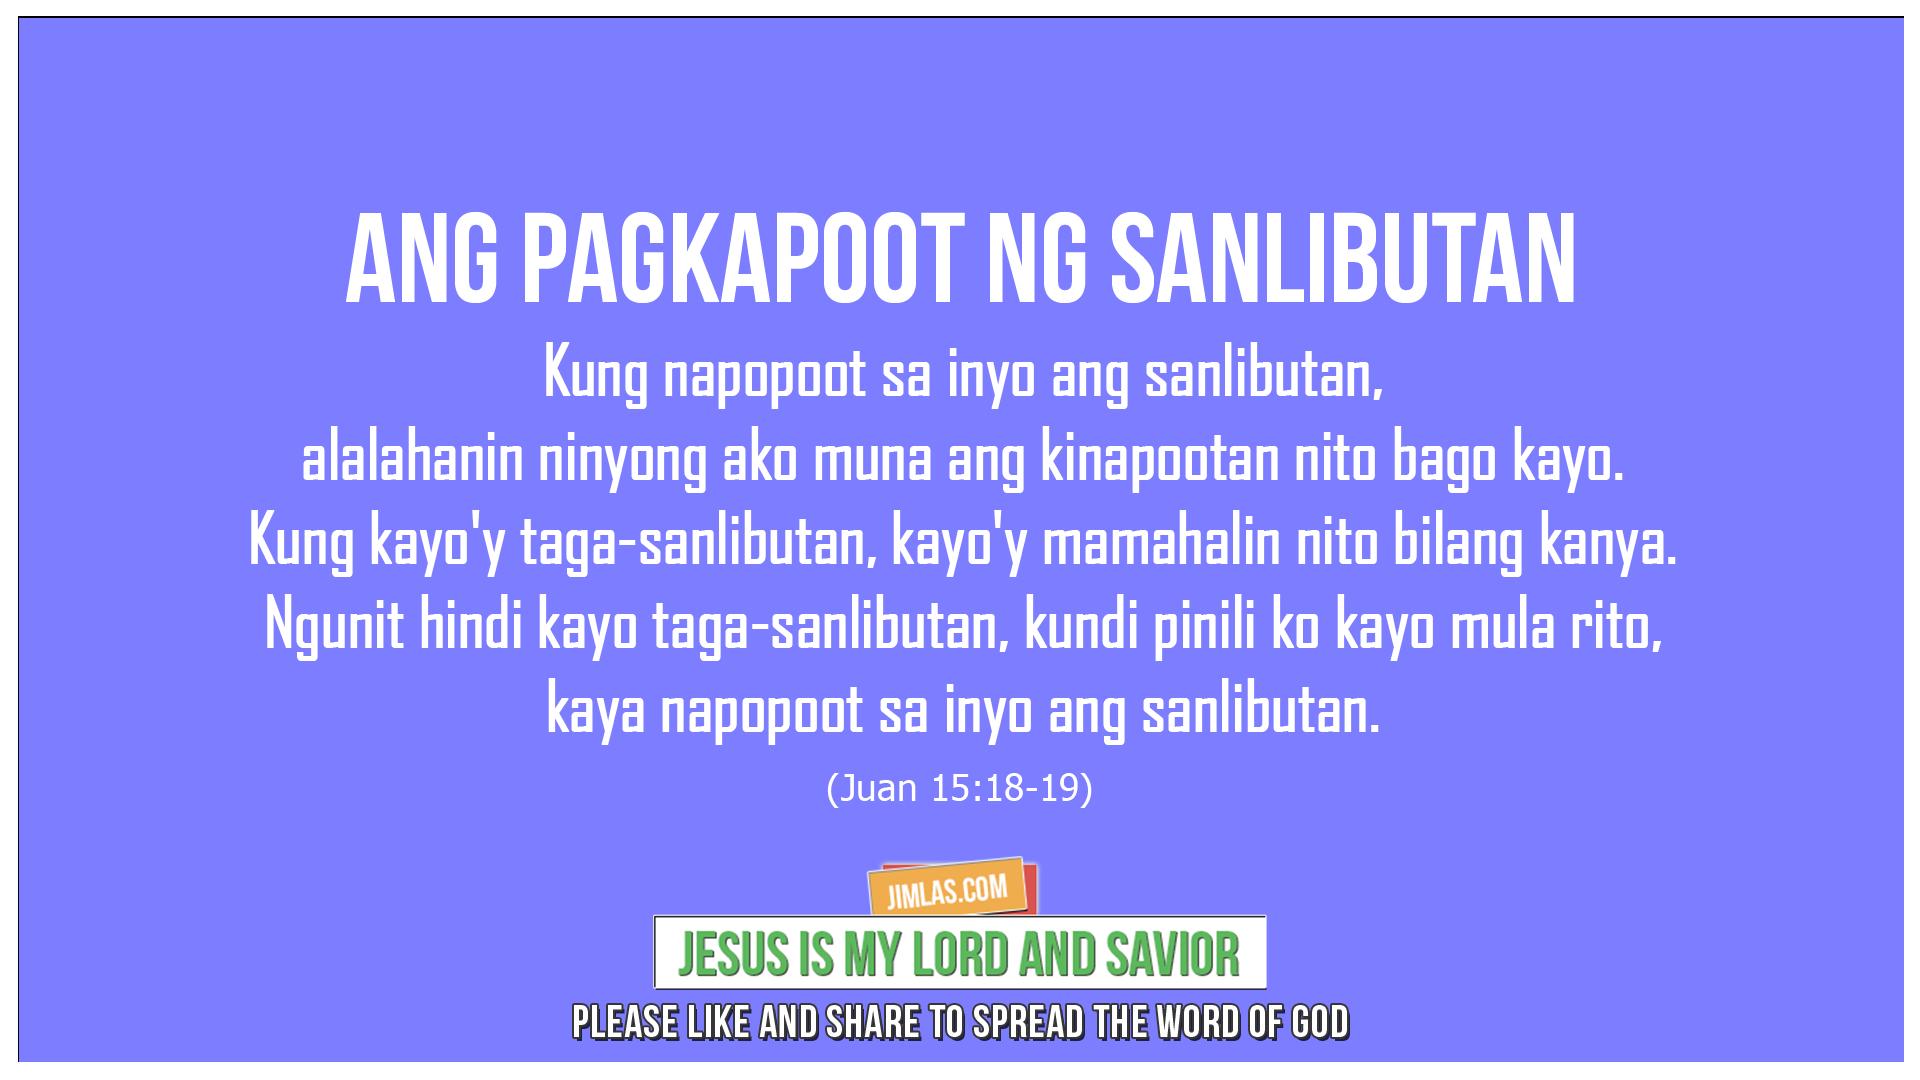 Juan 15 18-19, Juan 15:18-19